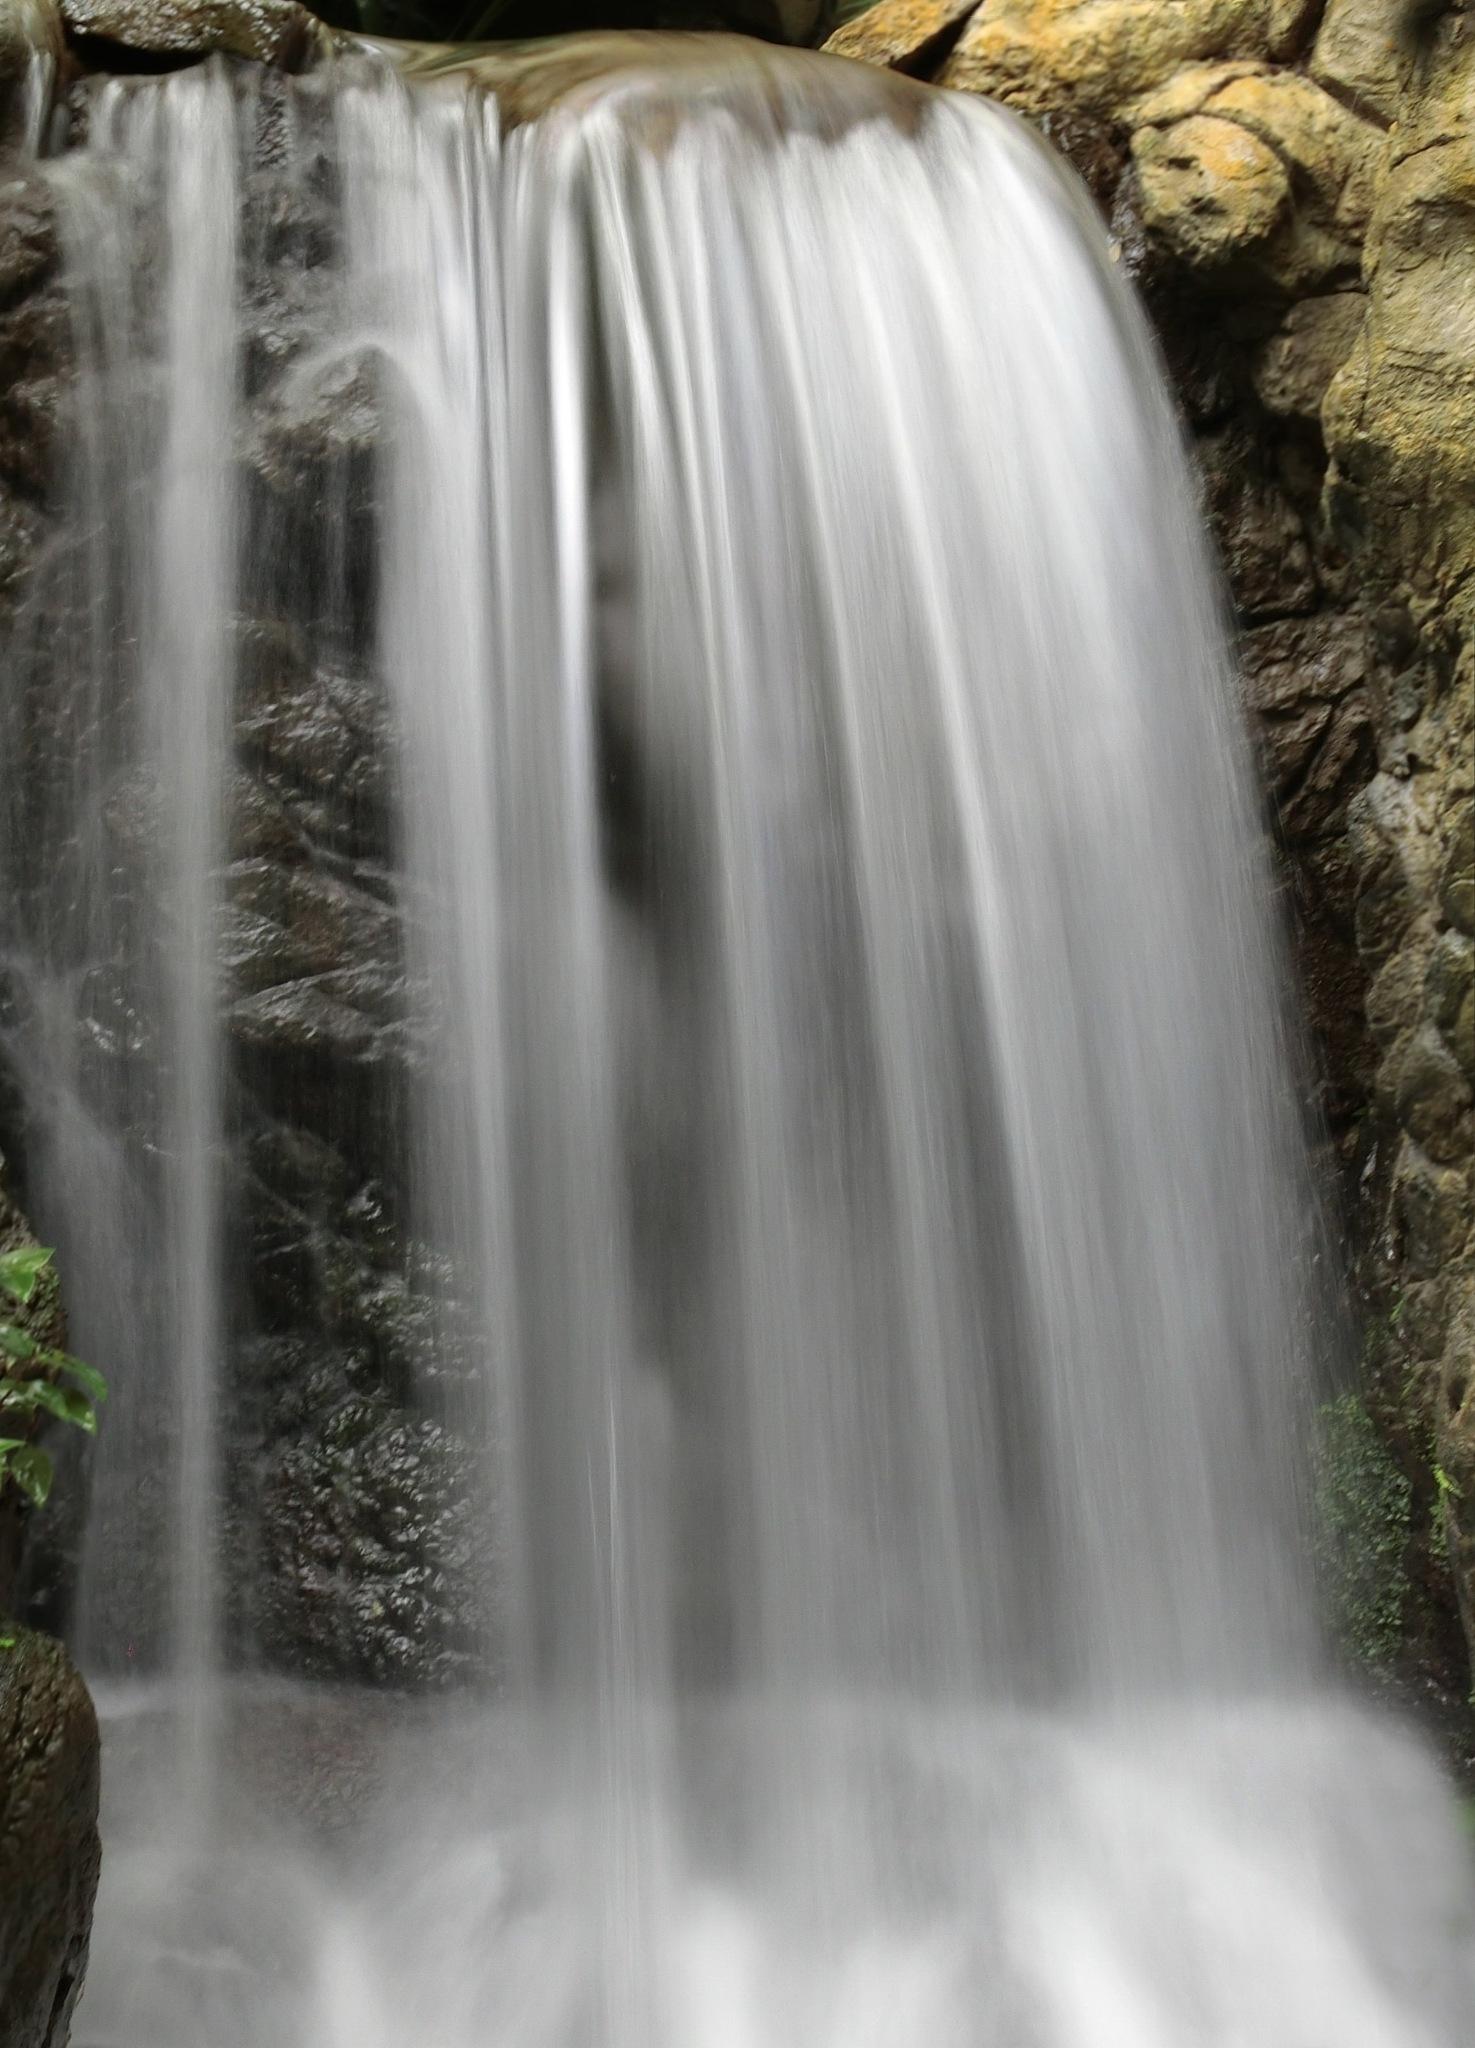 Waterfall-3 by pop88123